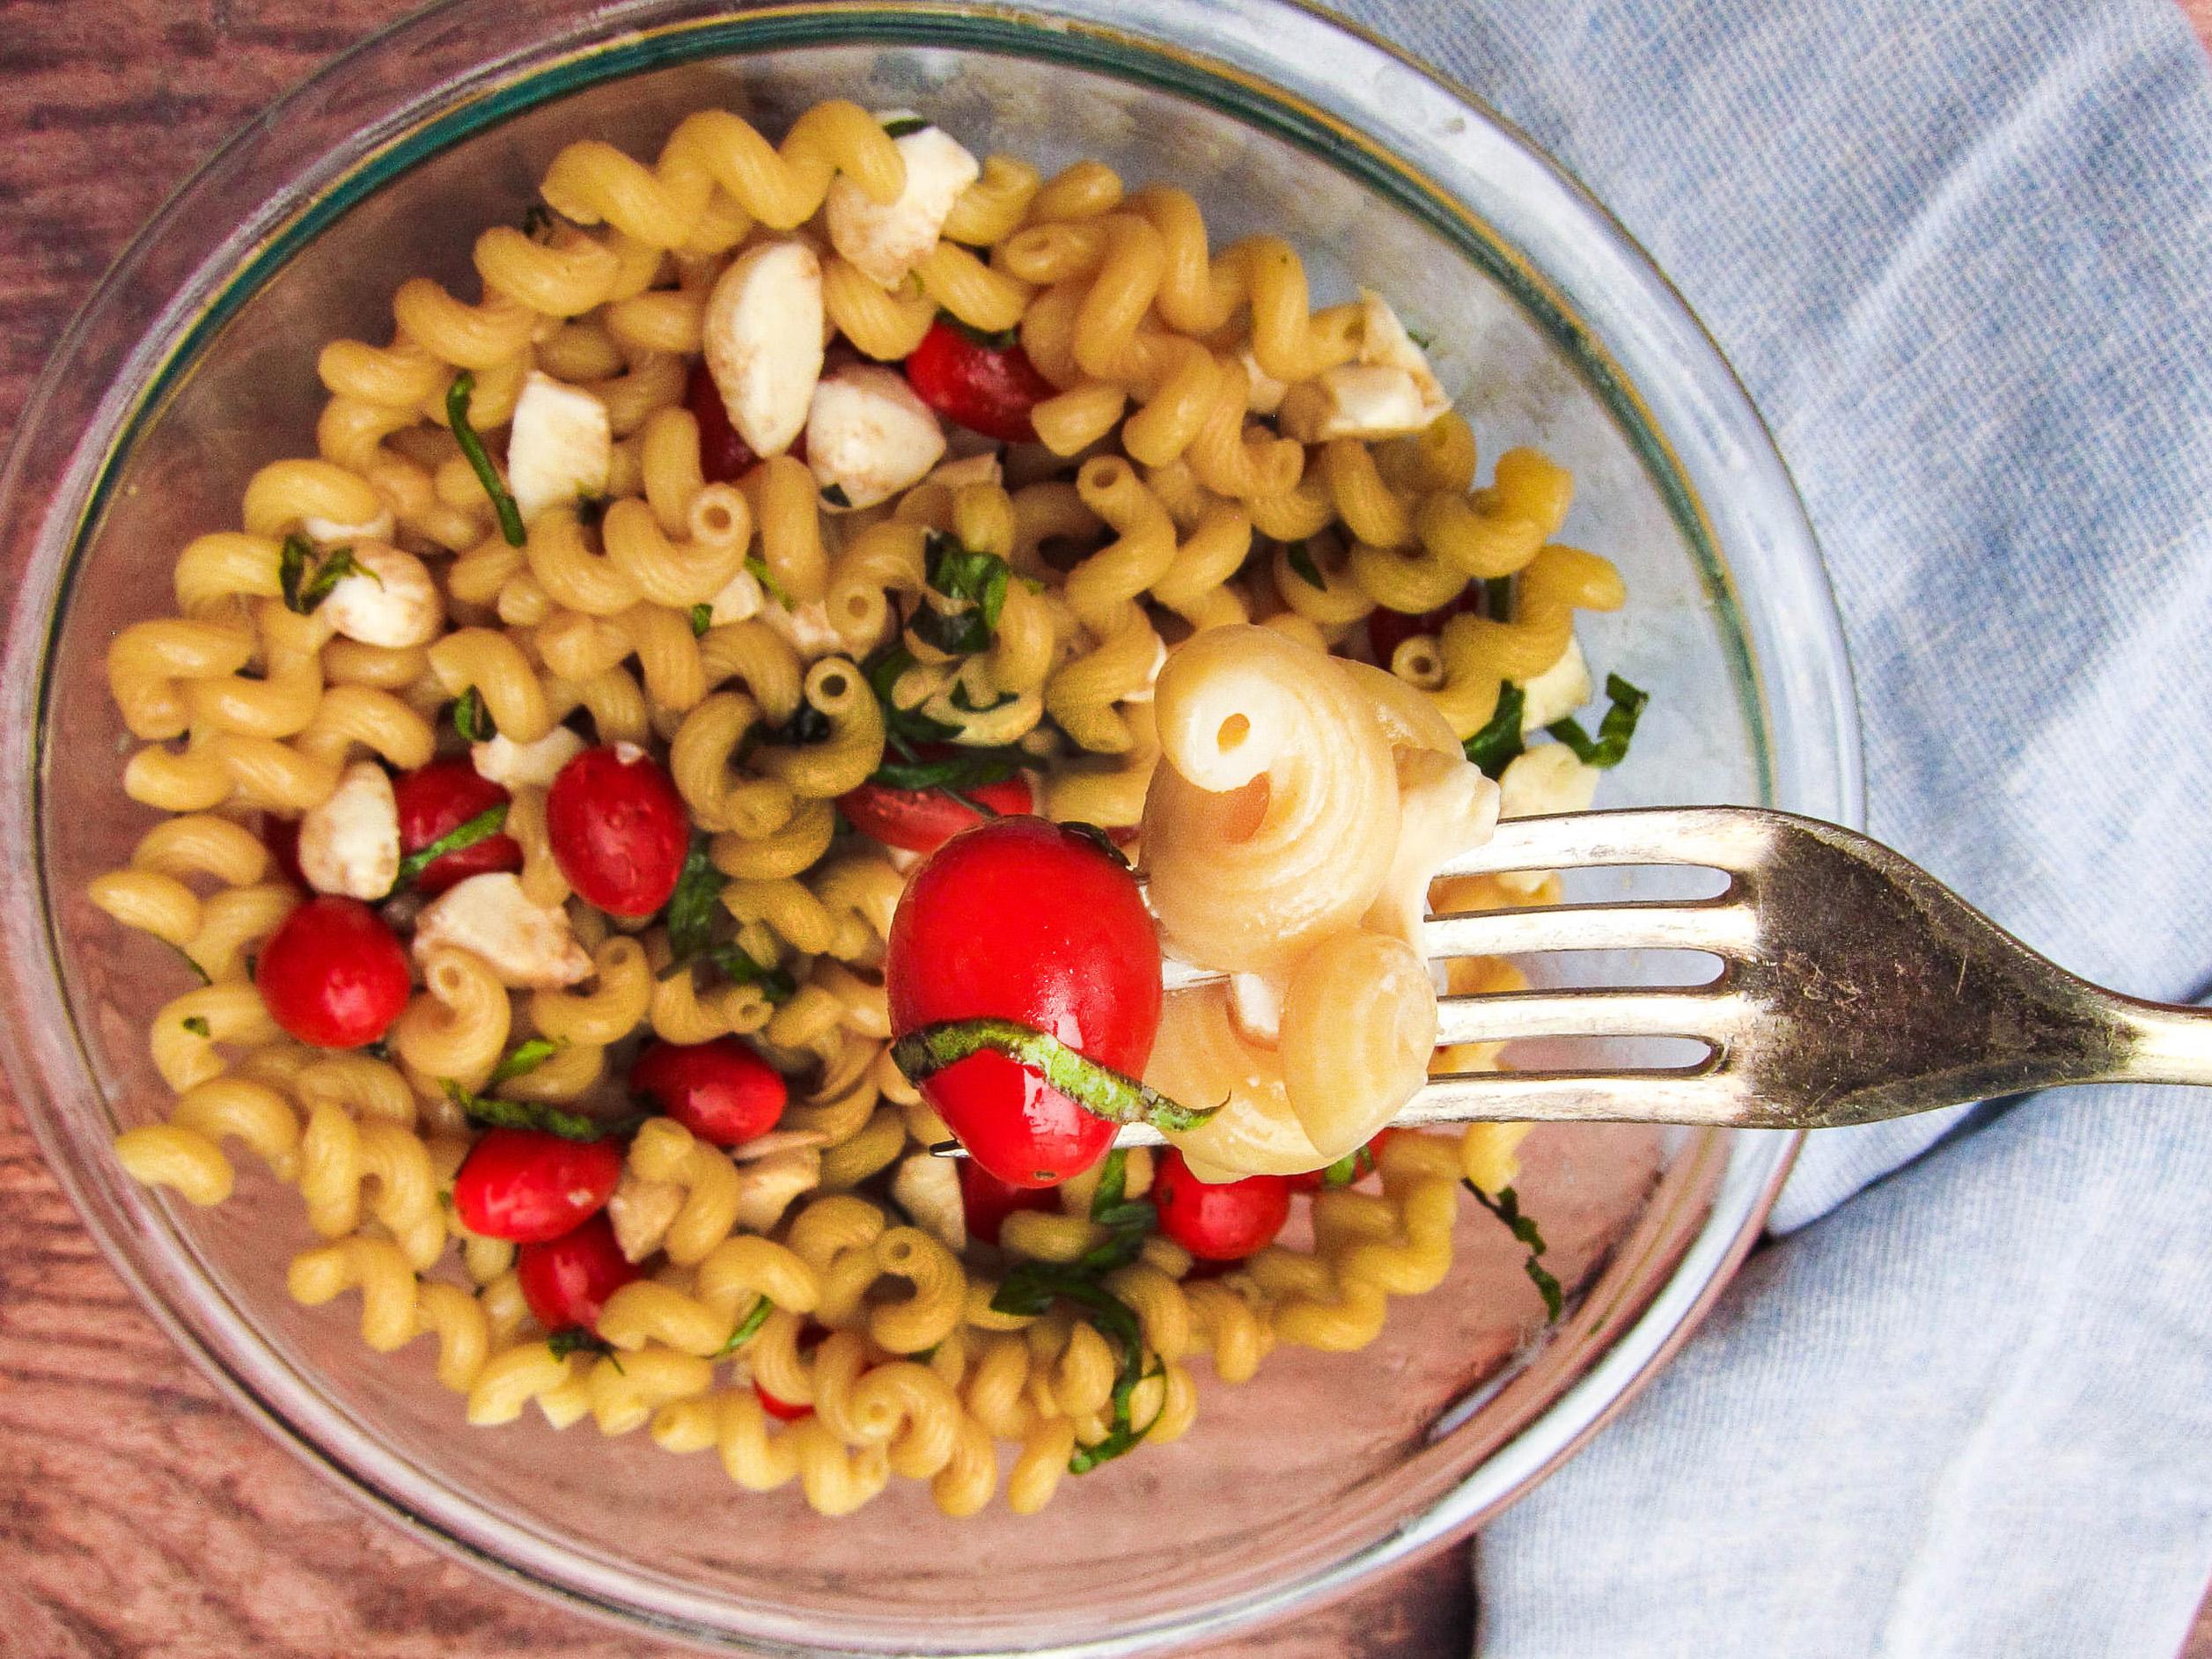 Fork stabbing into pasta salad.